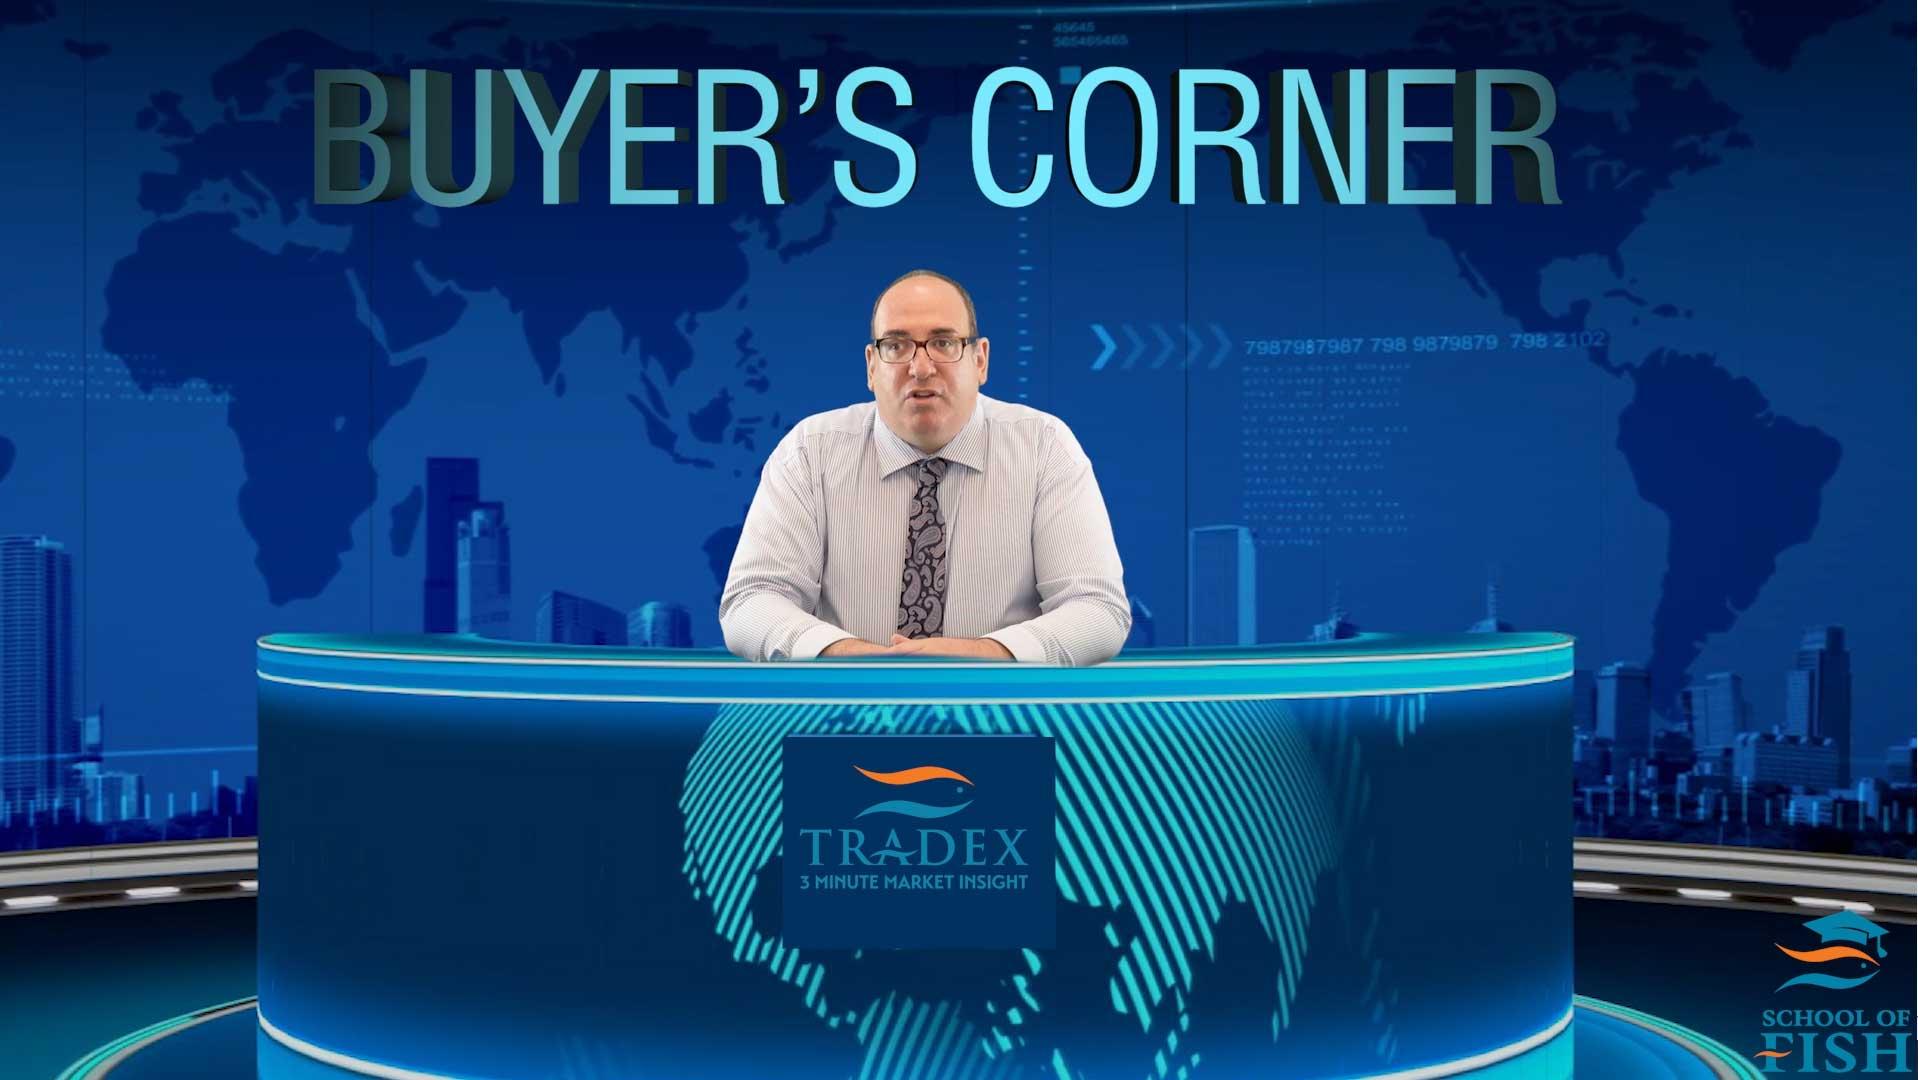 Buyers Corner